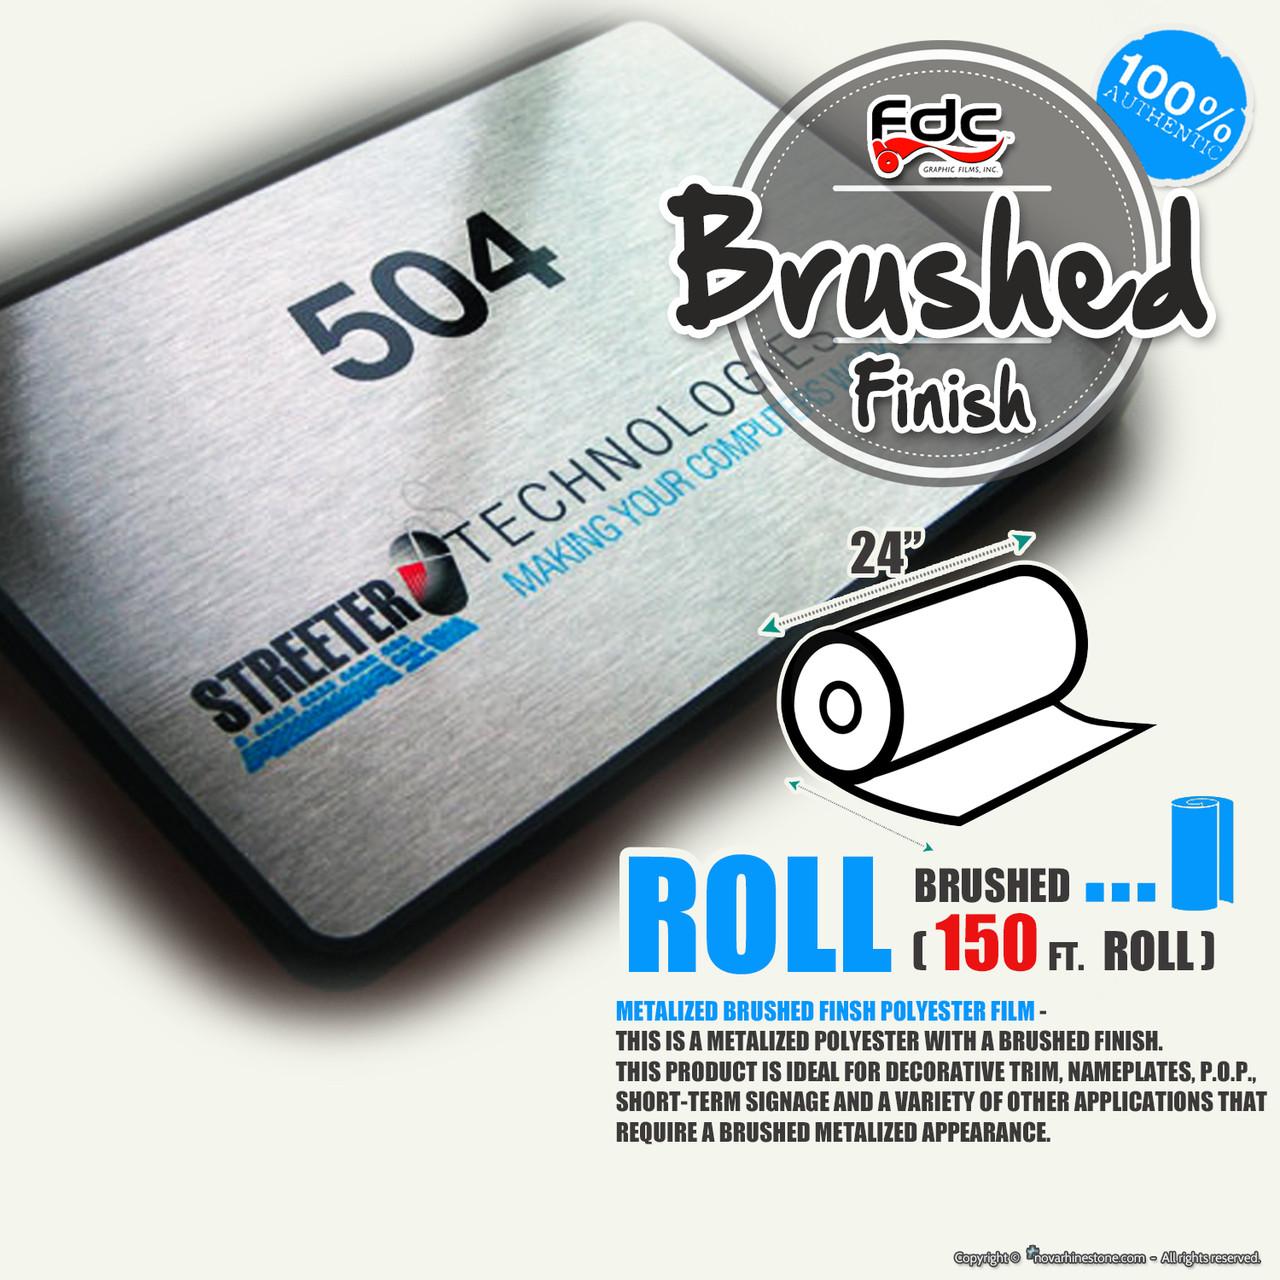 Brushed Finish Polyester Vinyl - FDC 2801 - 24